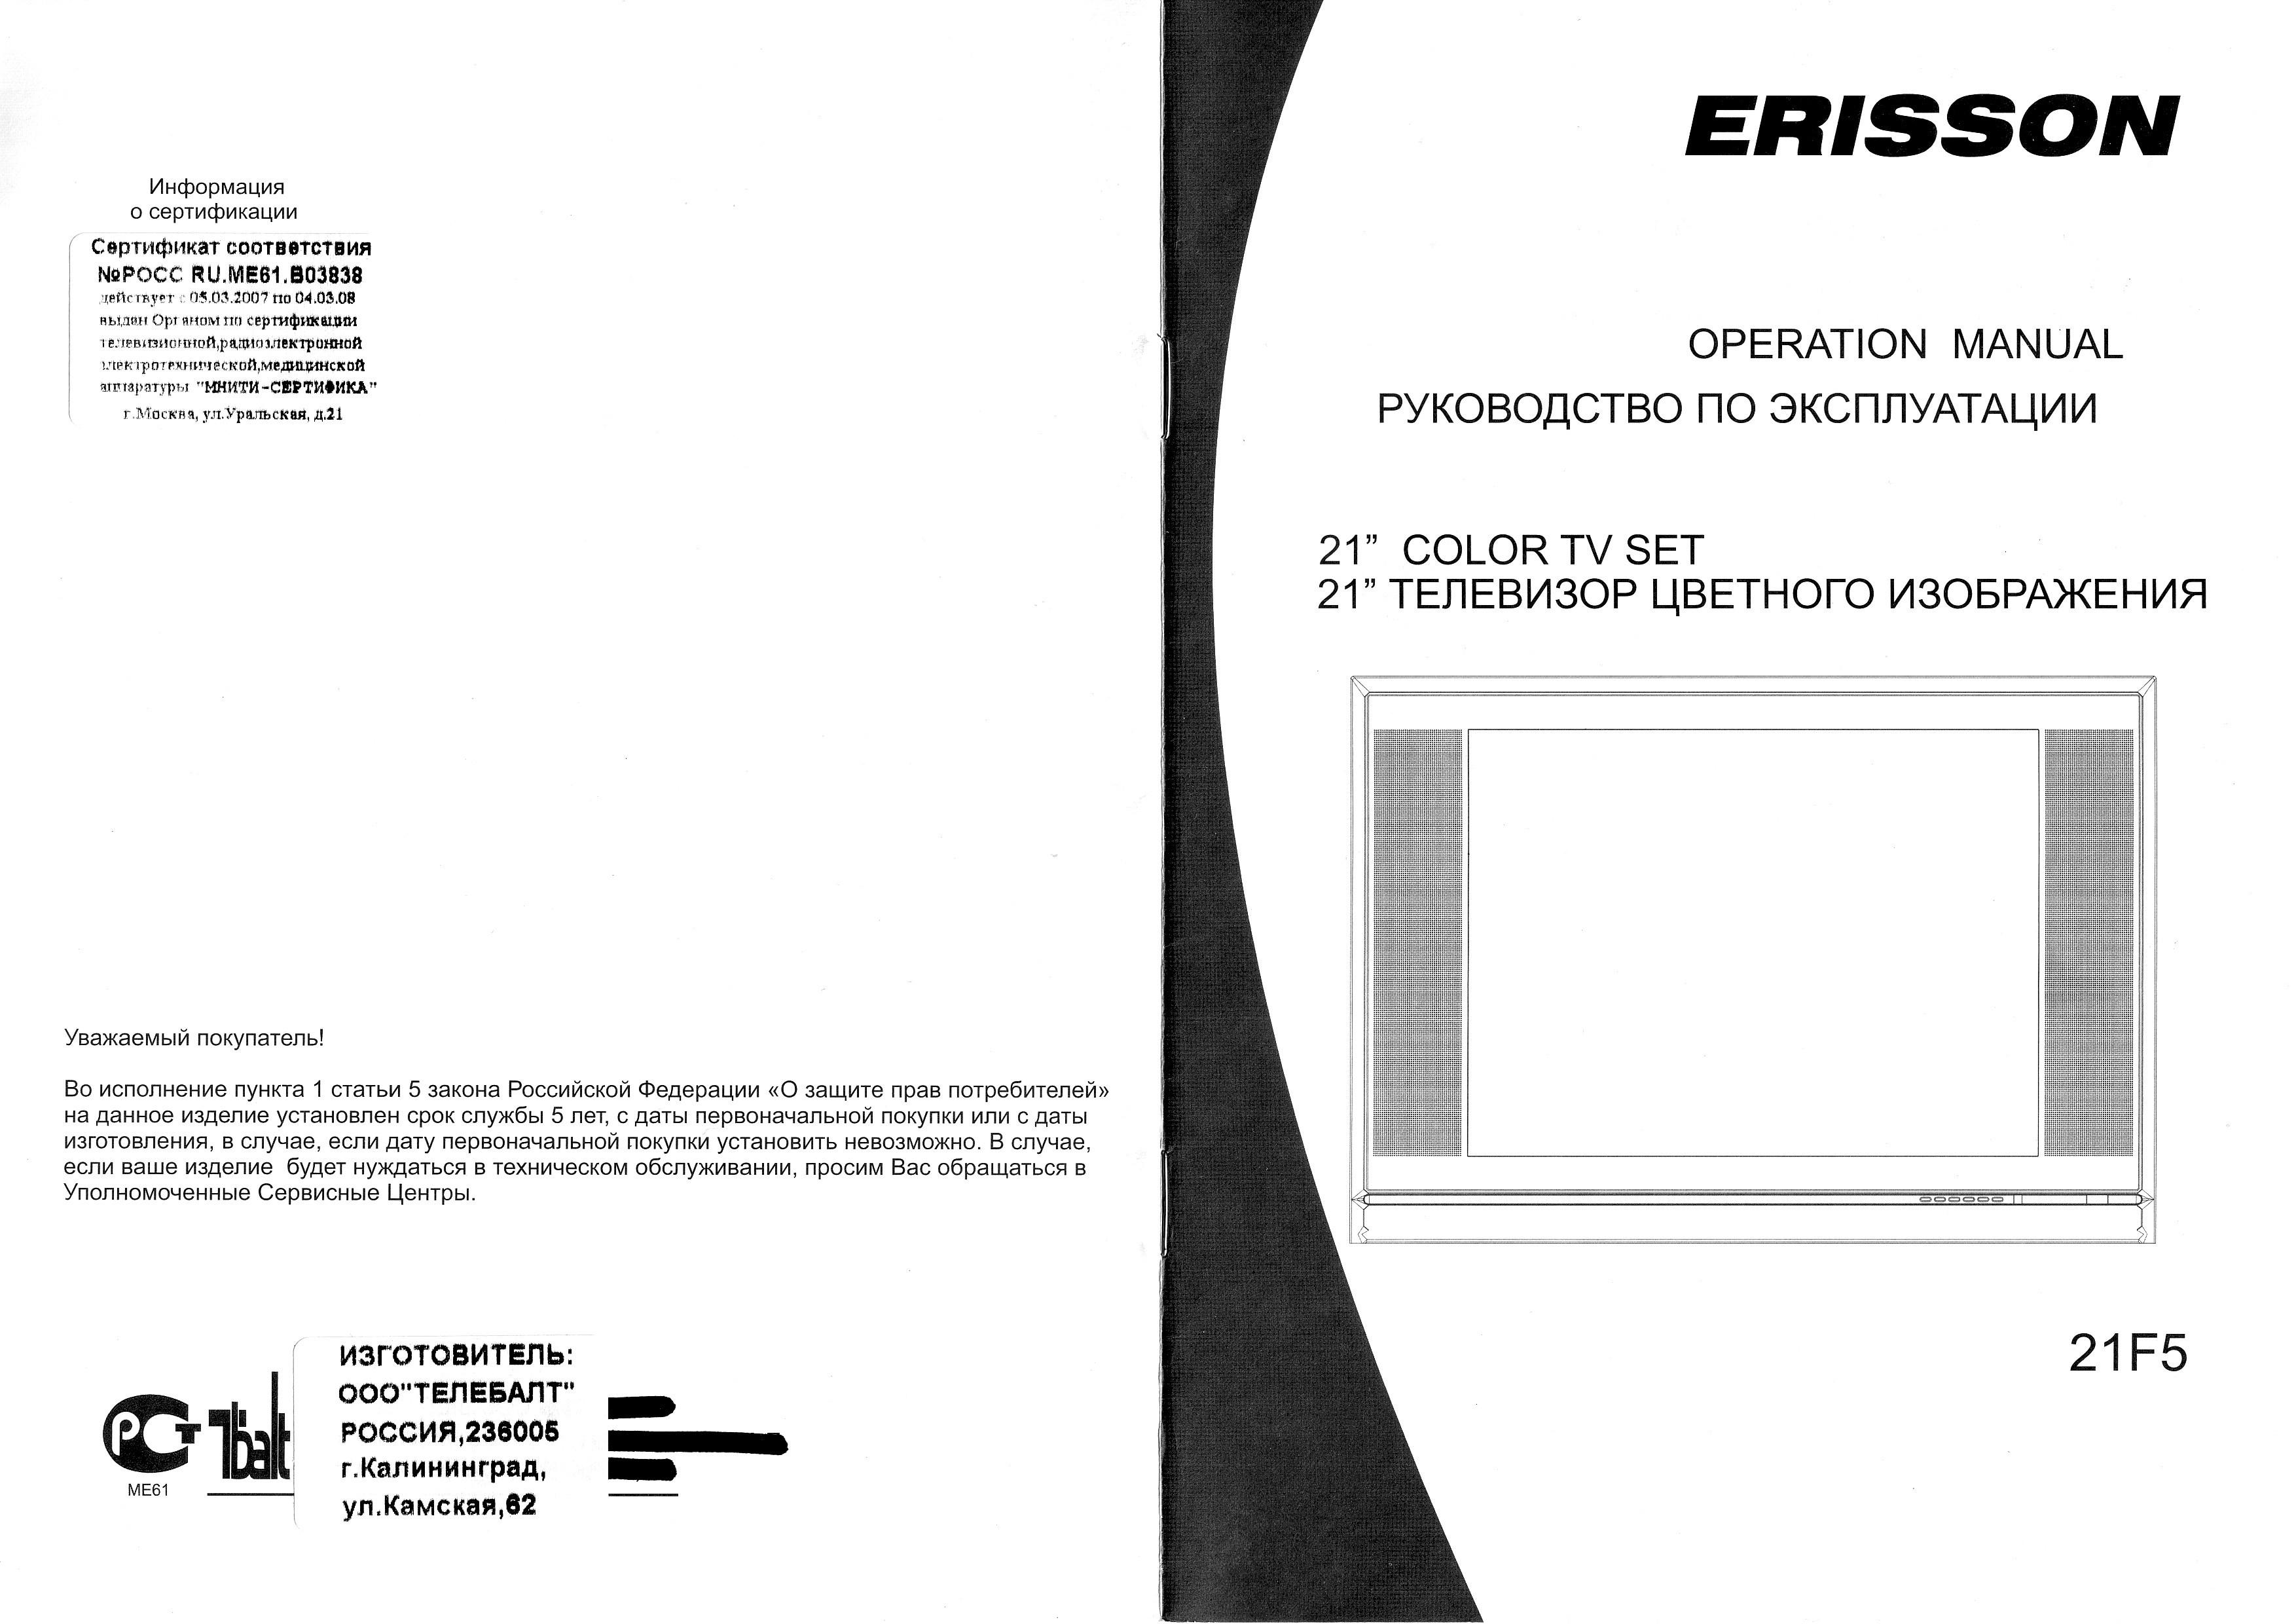 Мануал к телевизору erisson 2106